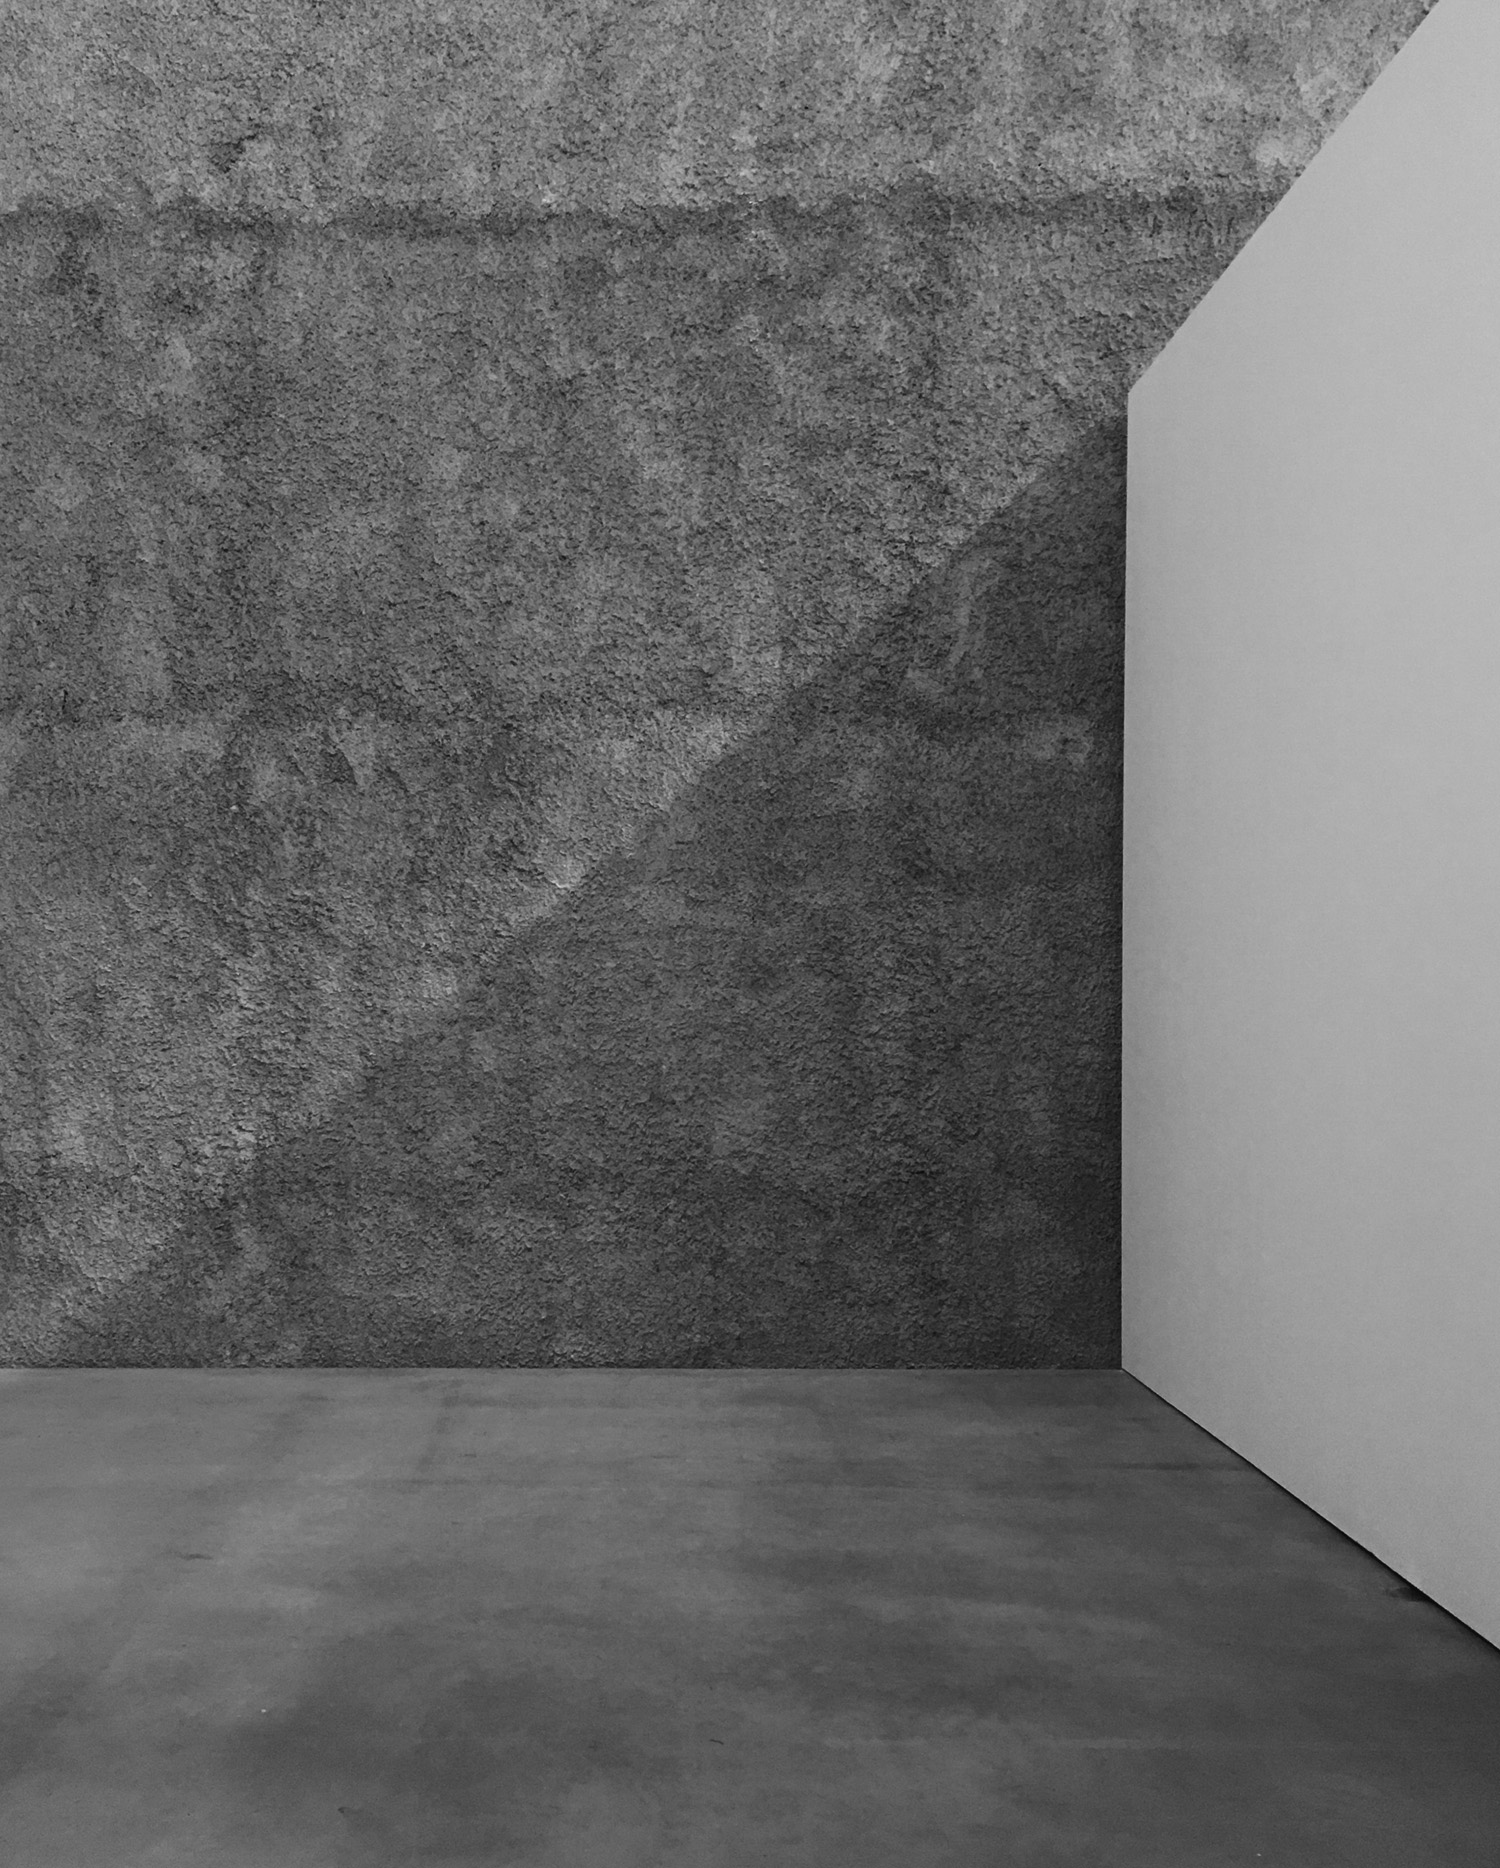 Emily-Grundon_architecture_spaces_0010.jpg